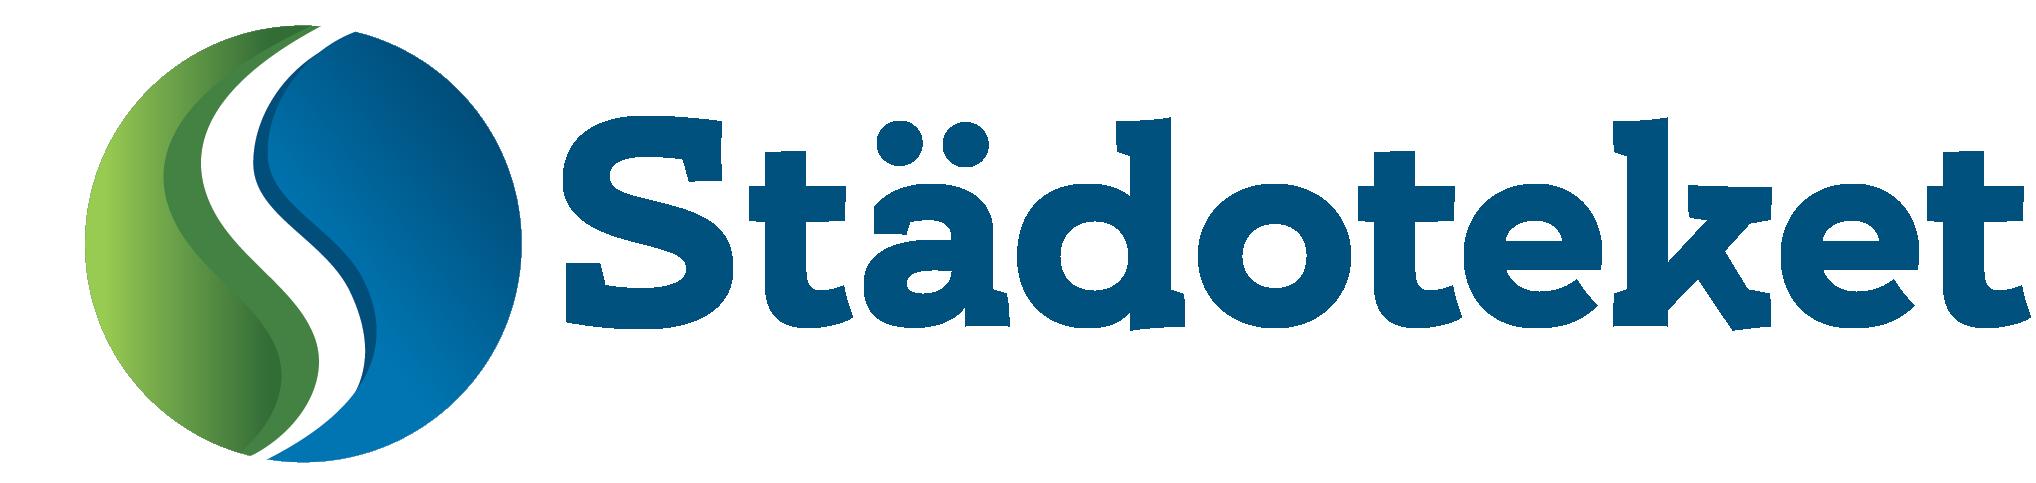 s logo png